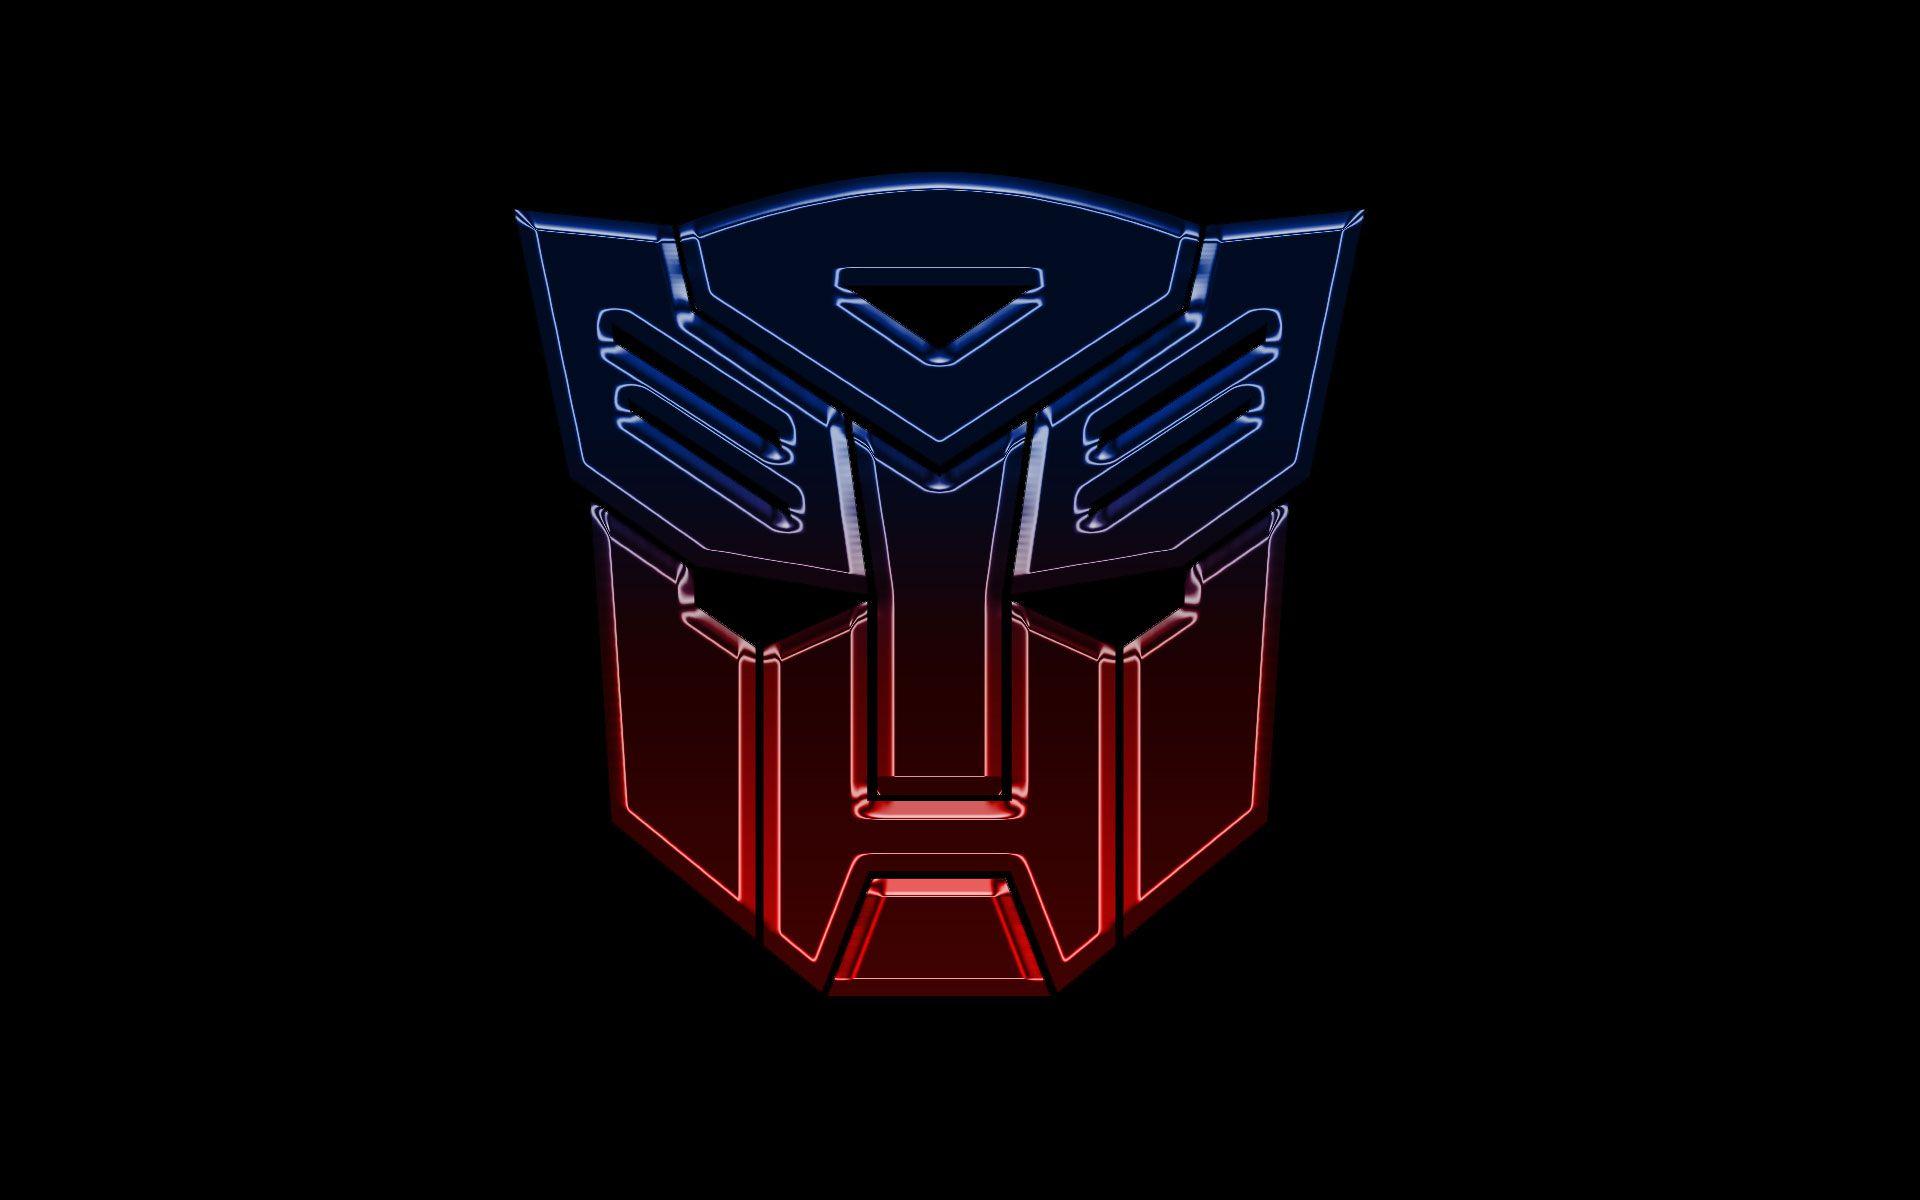 hd wallpaper of transformers autobots logo widescreen wallpaper